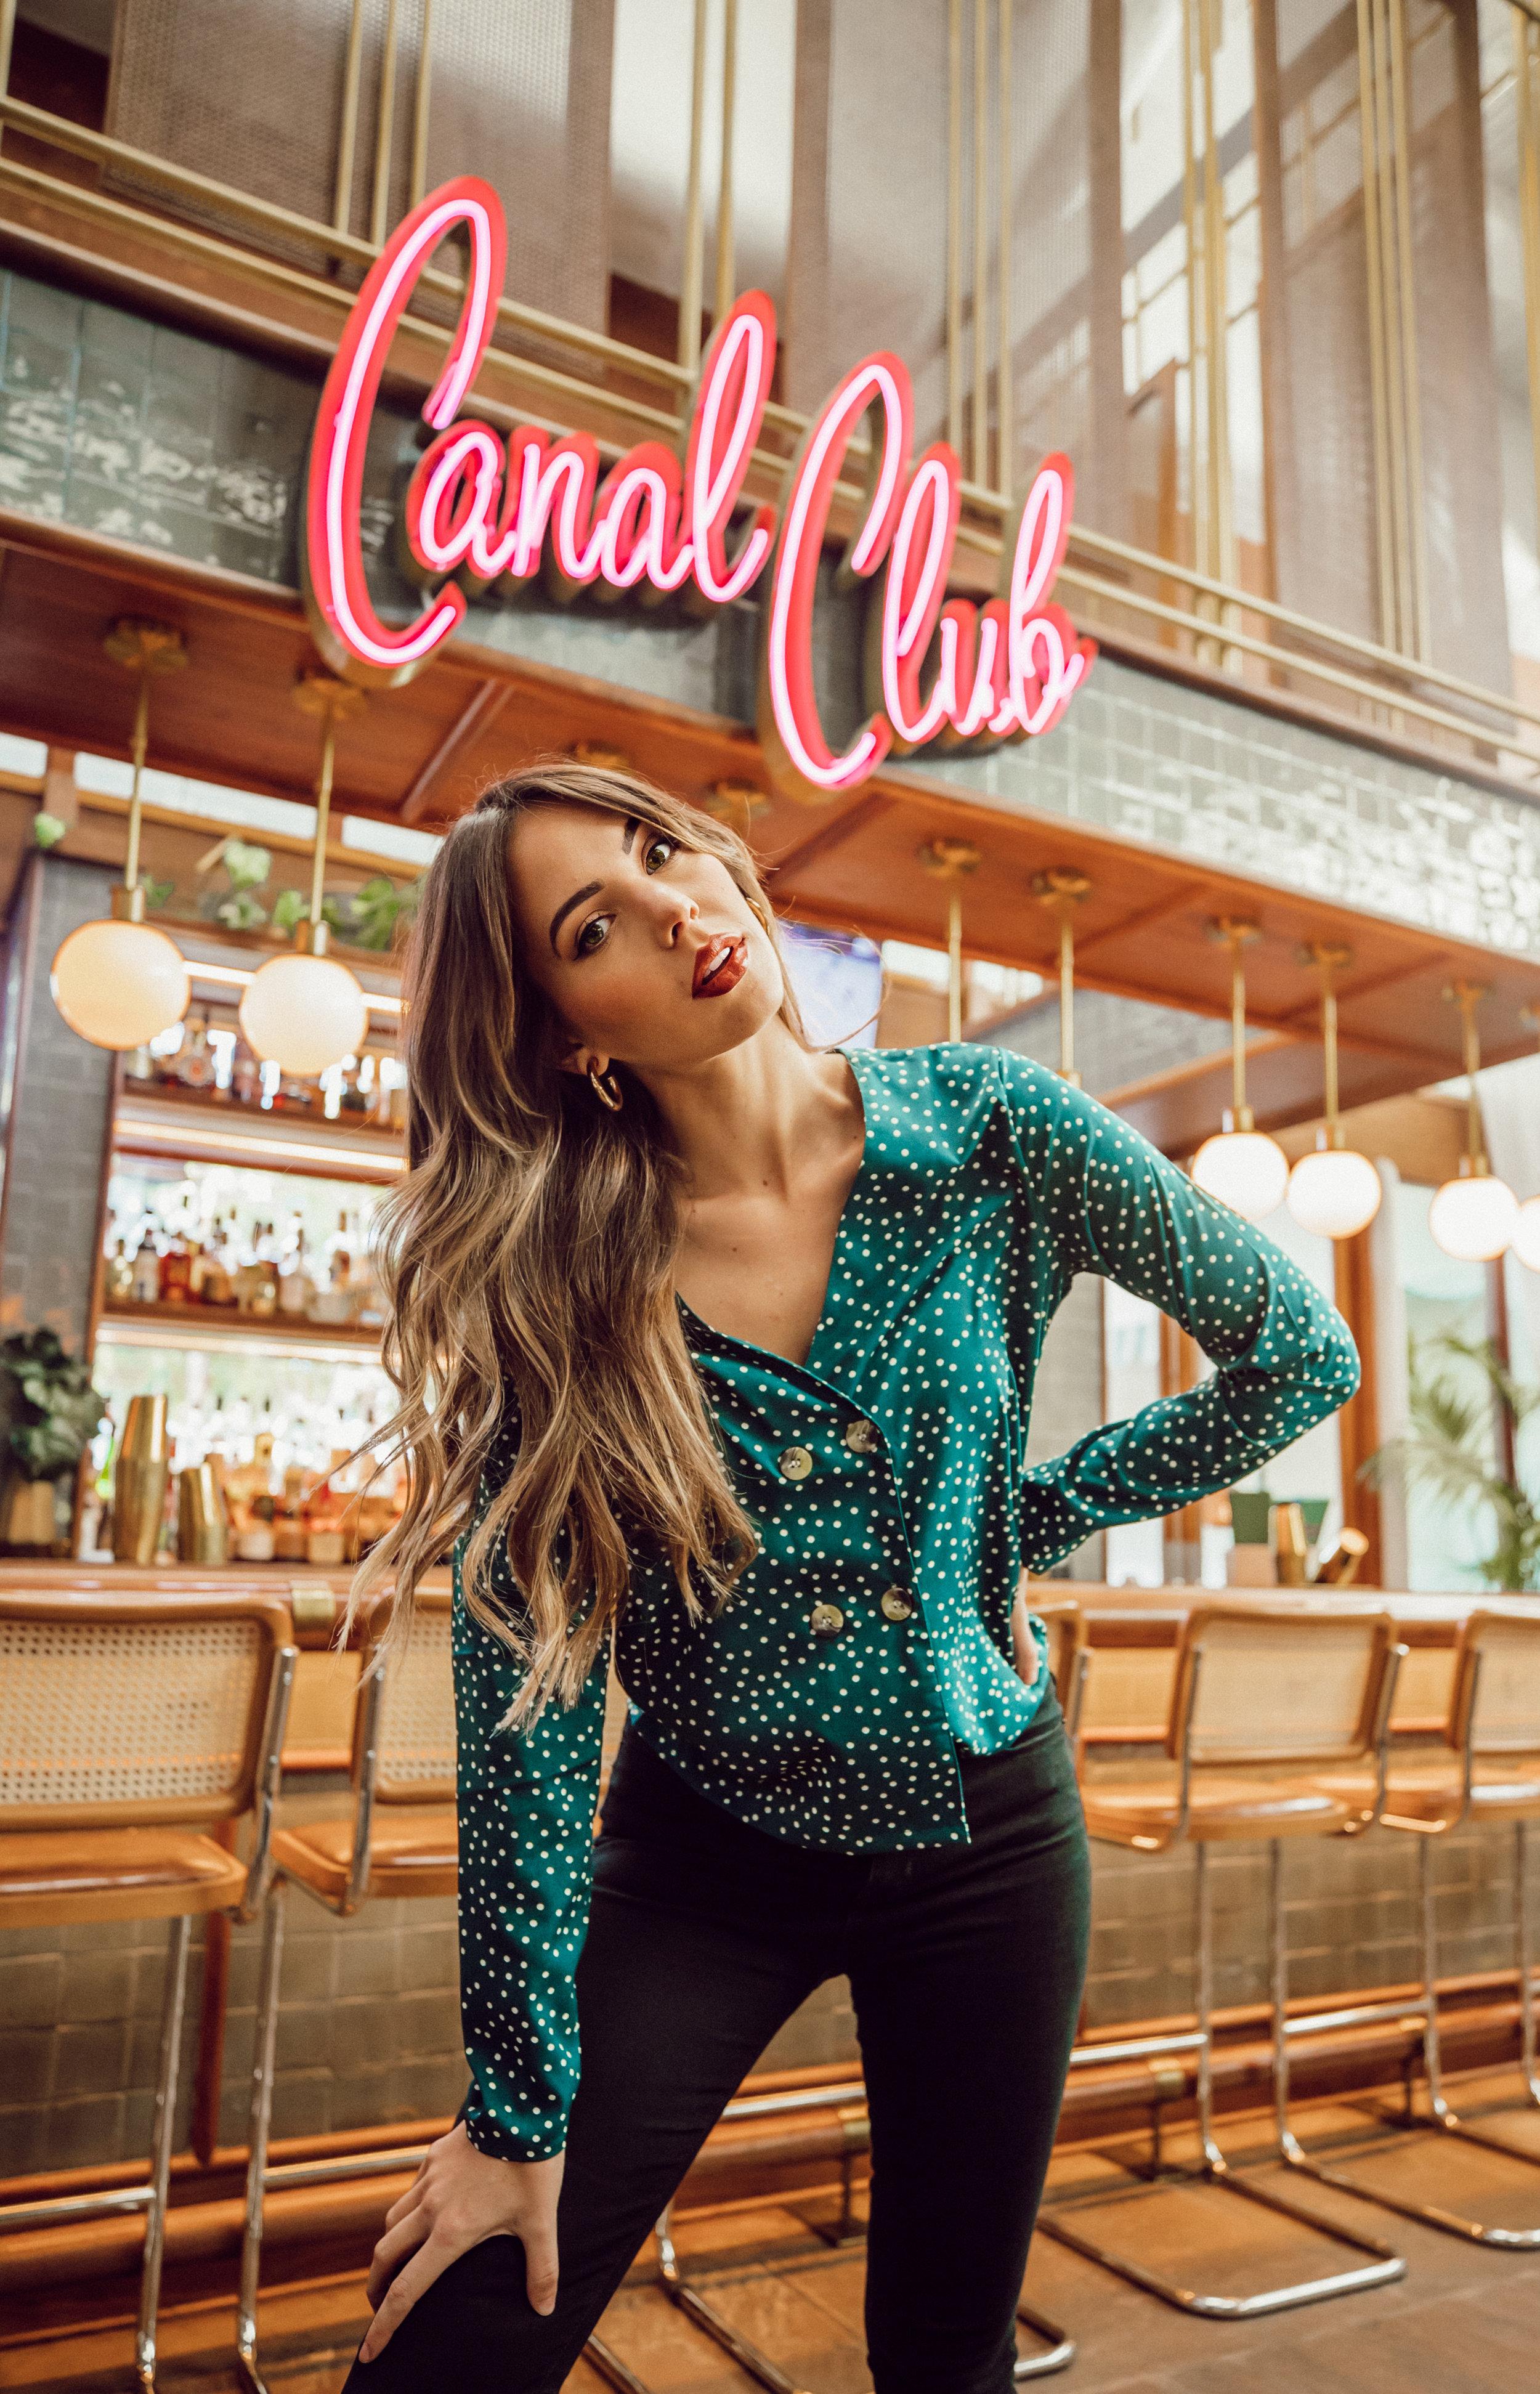 CanalClubredo-1.jpg